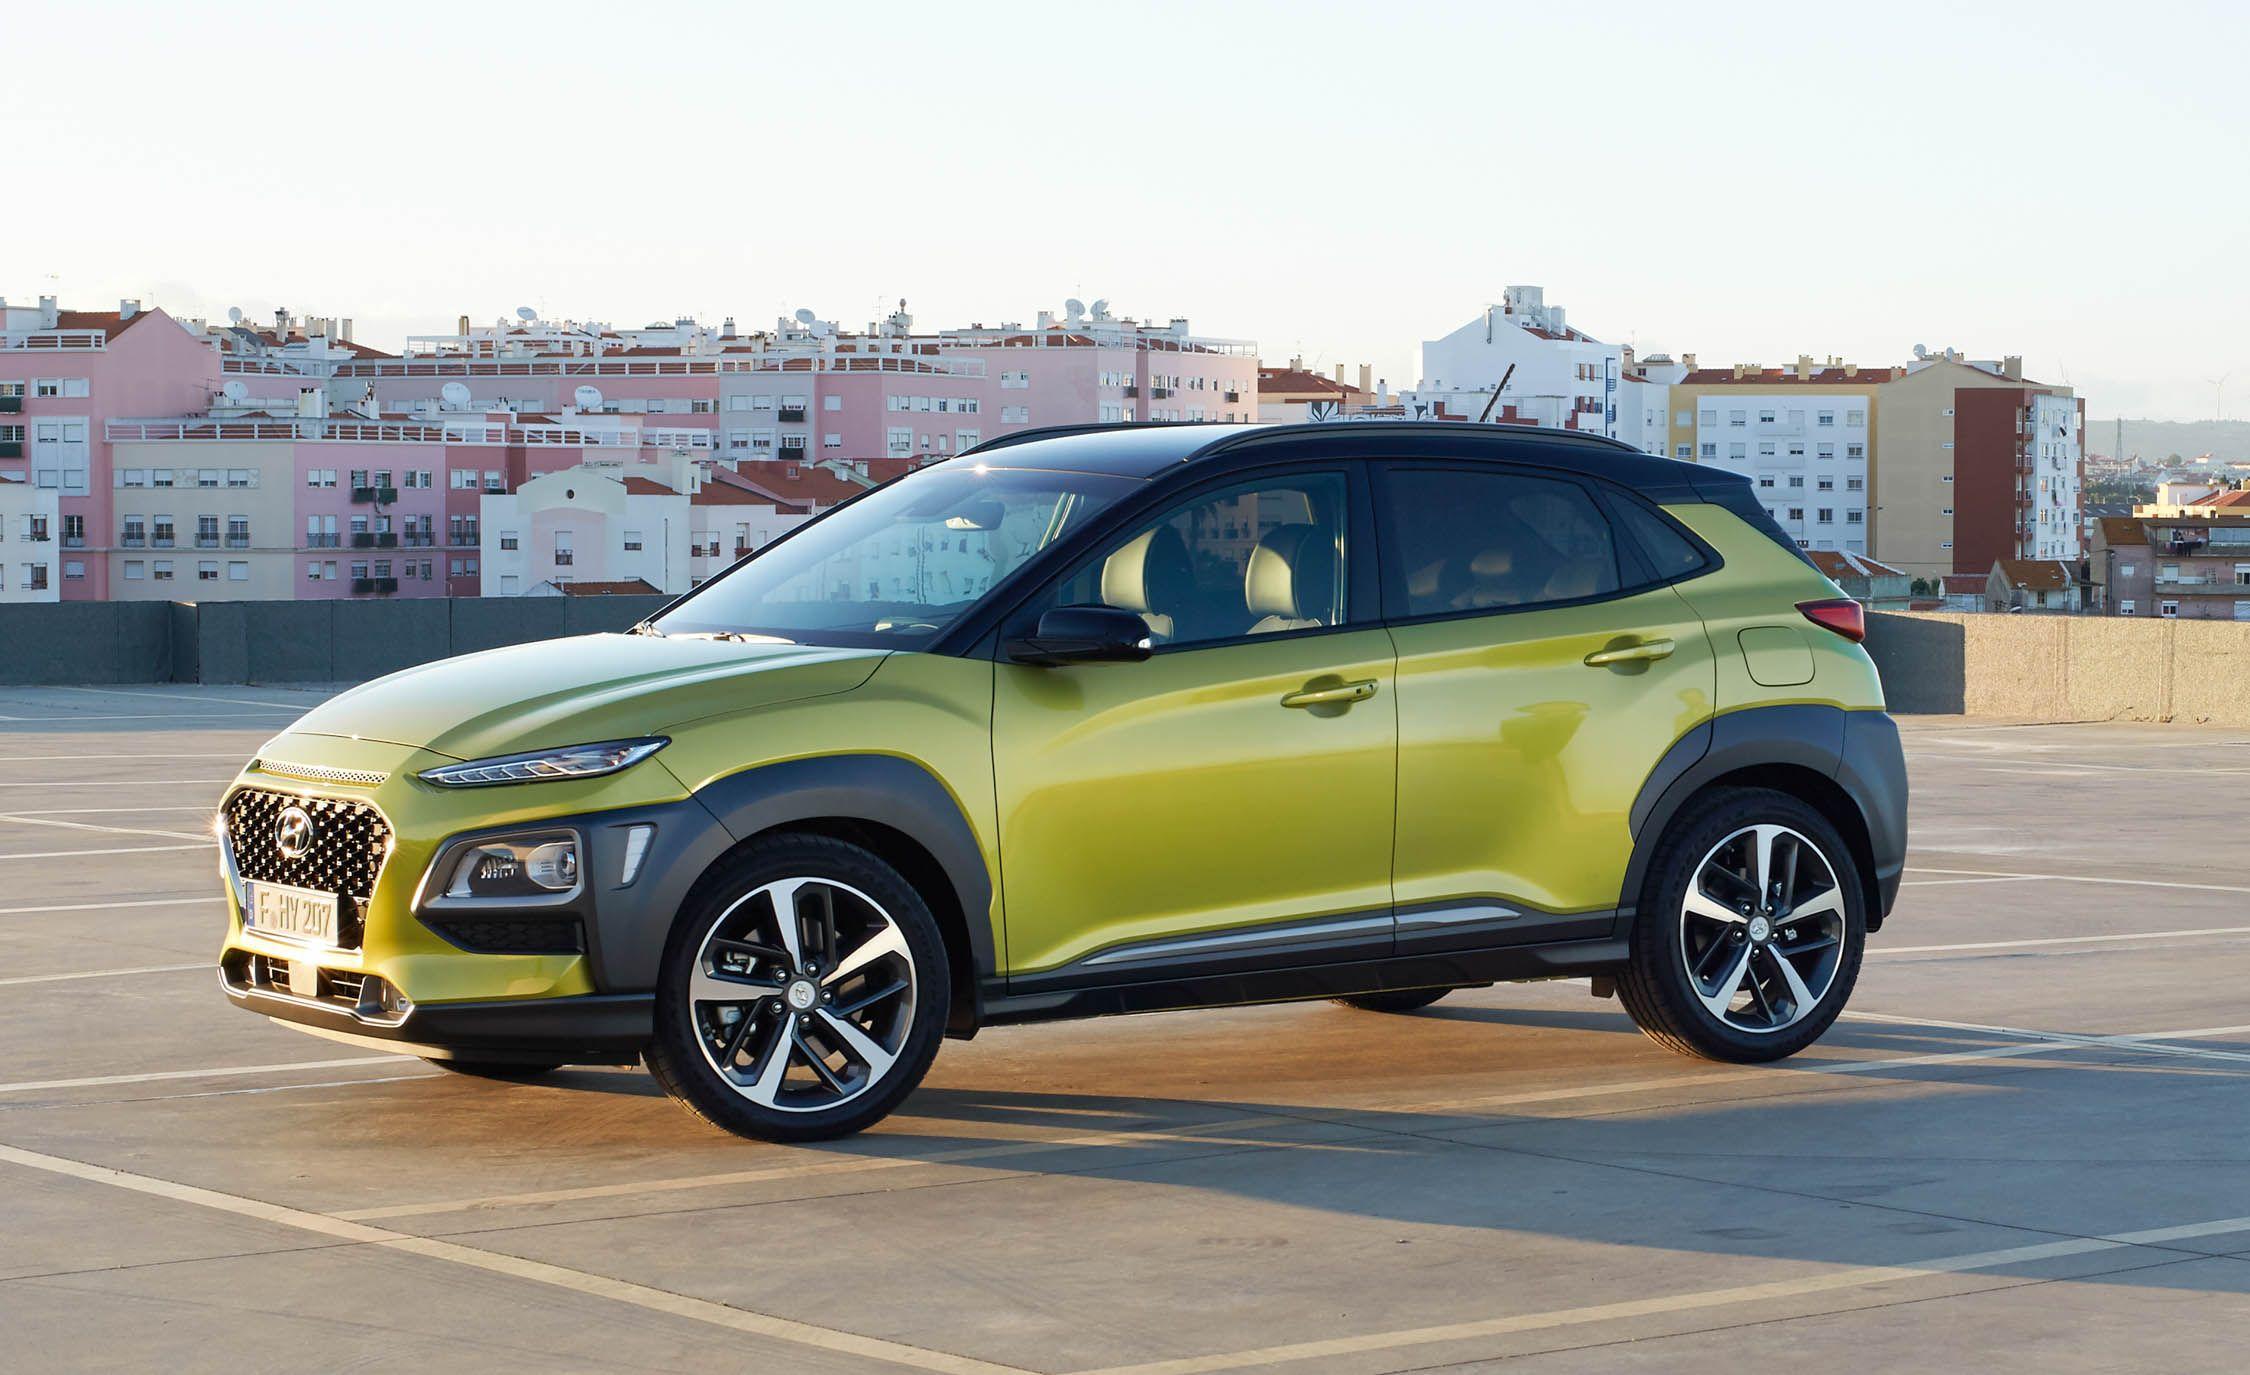 https://hips.hearstapps.com/amv-prod-cad-assets.s3.amazonaws.com/wp-content/uploads/2017/06/2018-Hyundai-Kona-108-1.jpg